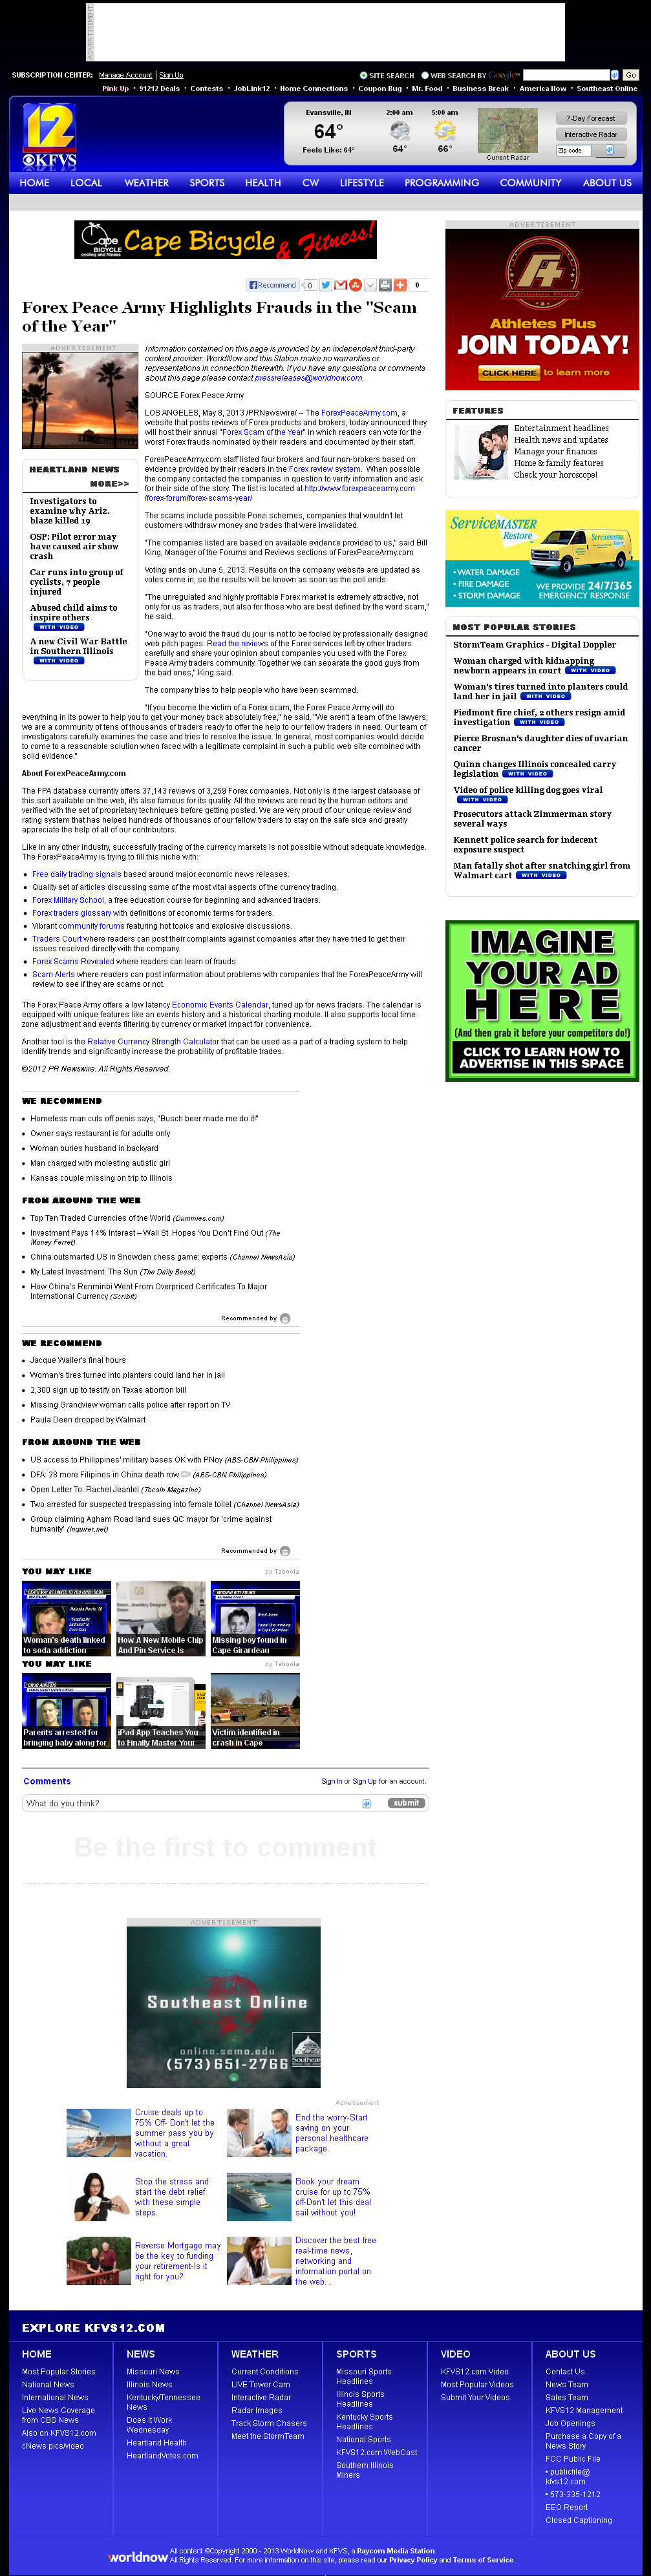 Forex Peace Army | KFVS CBS-12 (Cape Girardeau, MO)